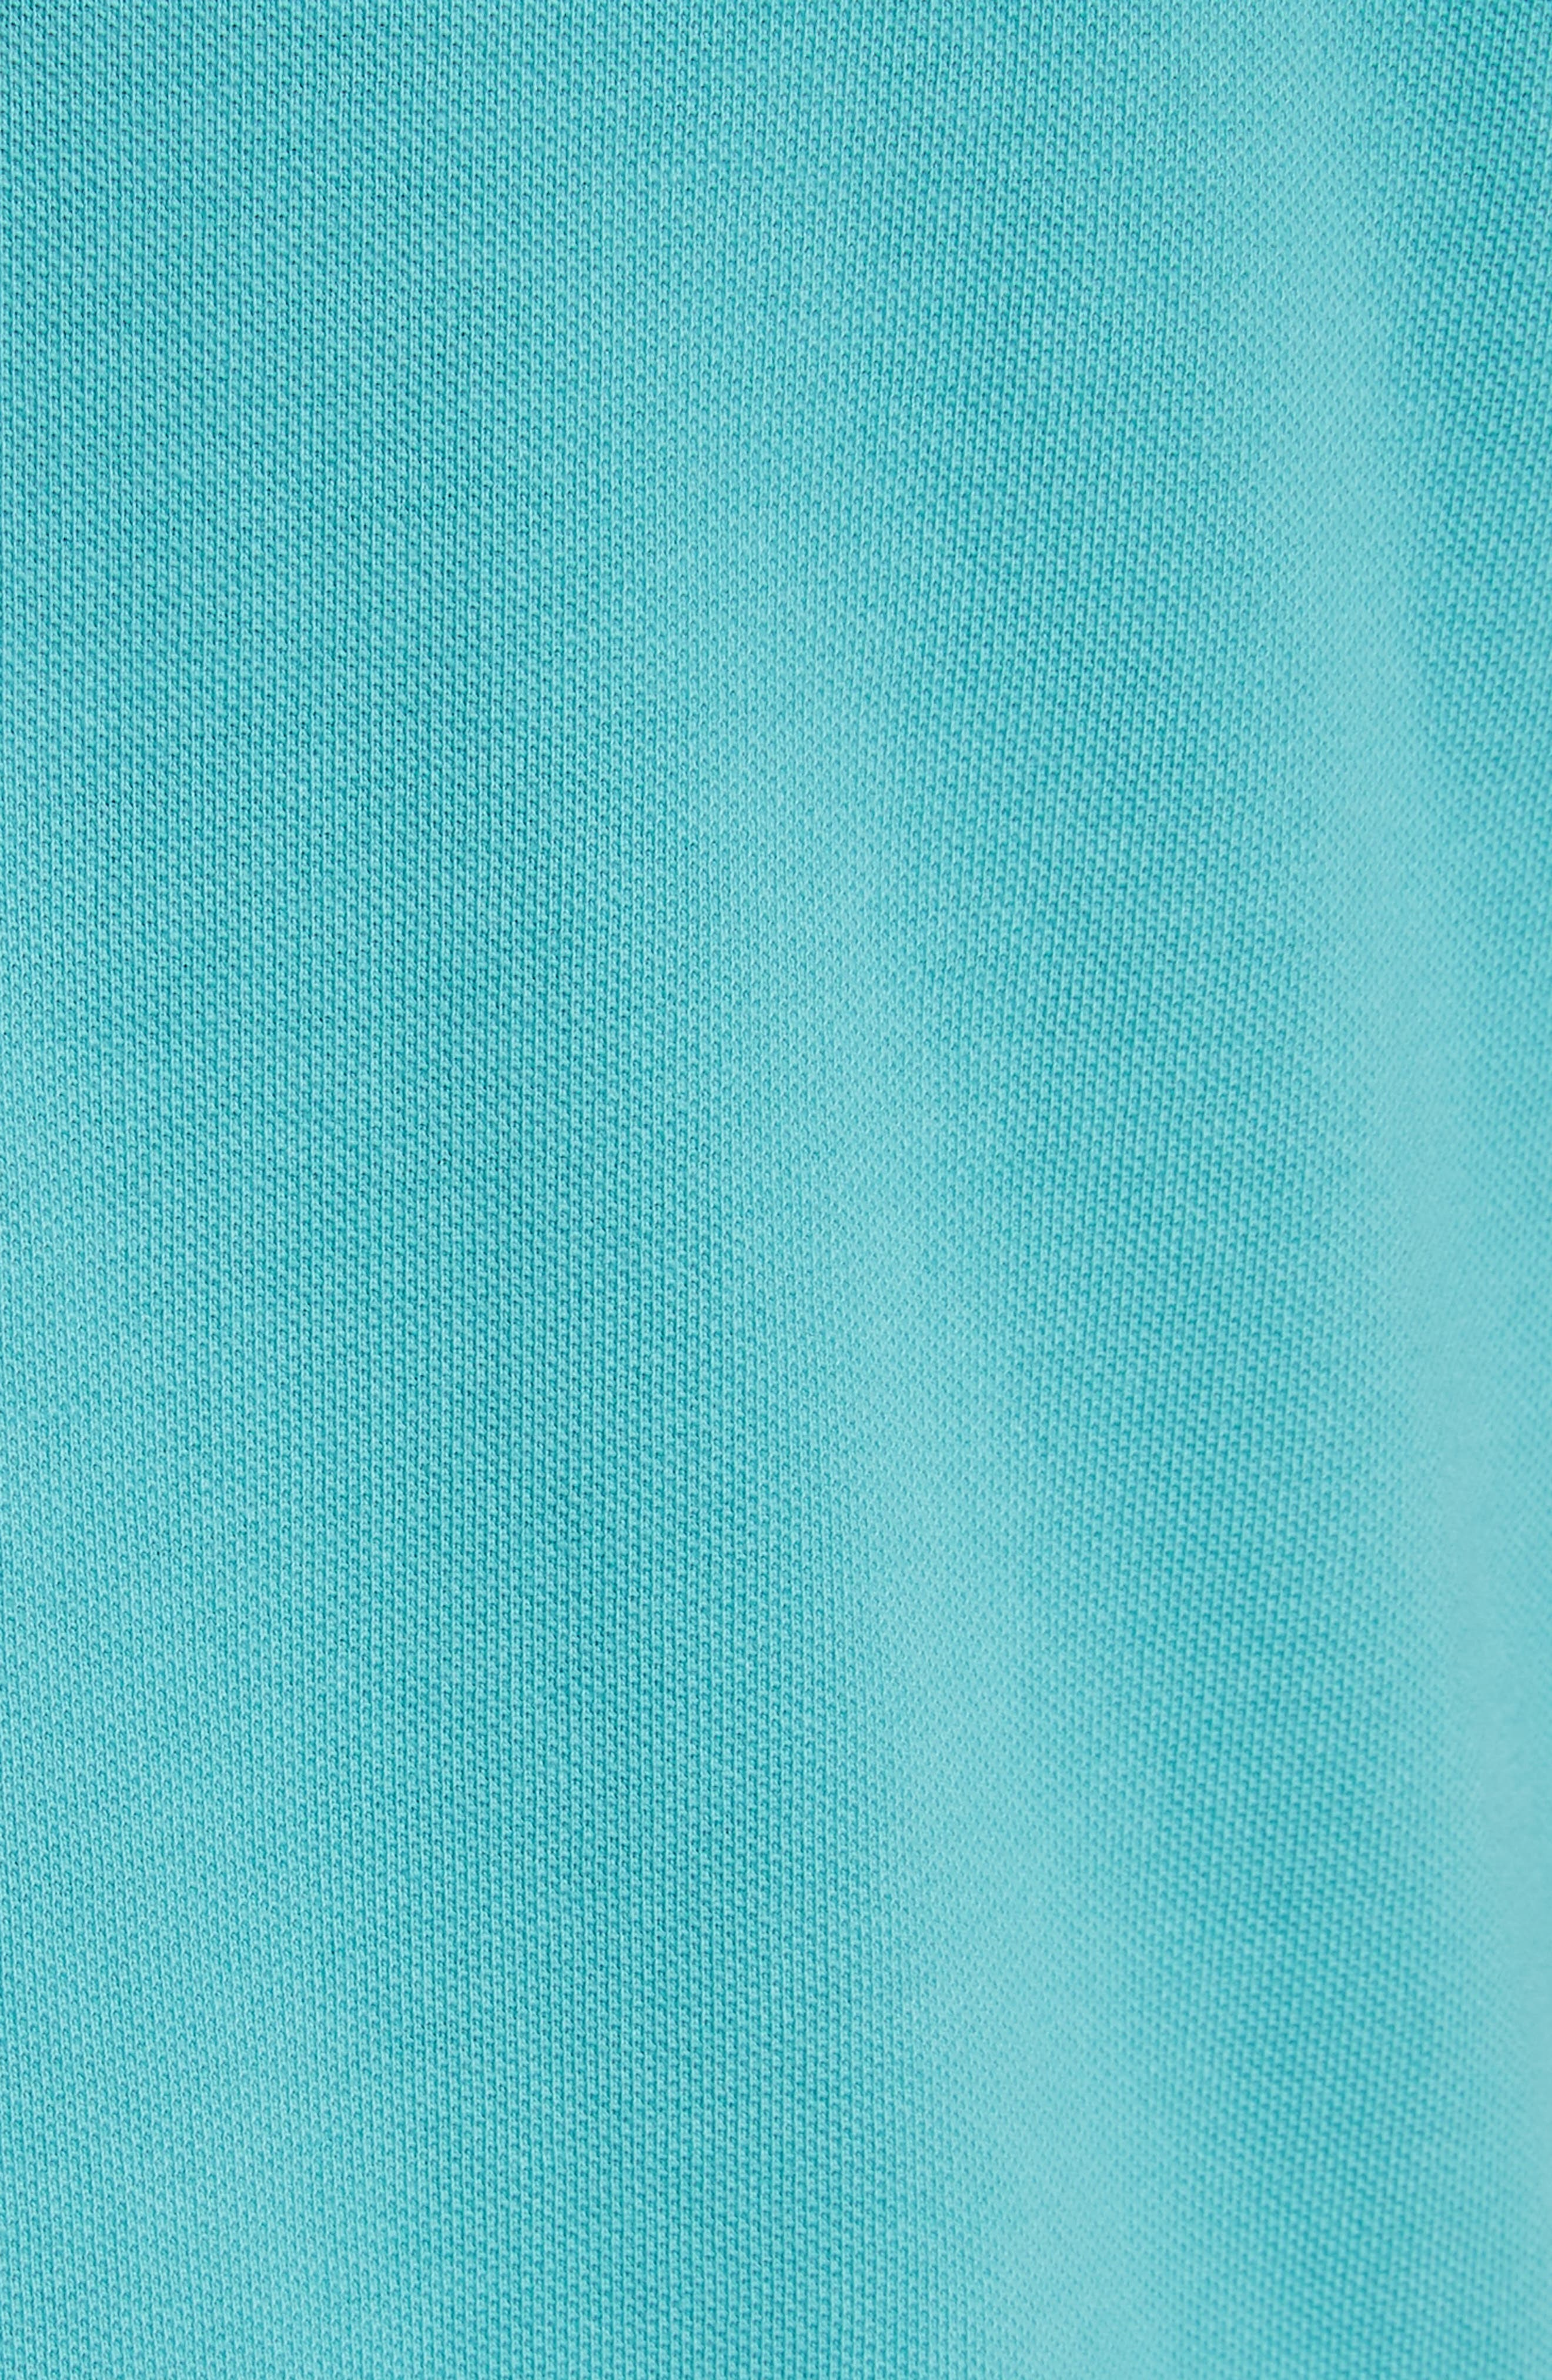 Madison Polo,                             Alternate thumbnail 5, color,                             71590-Soft Teal/White